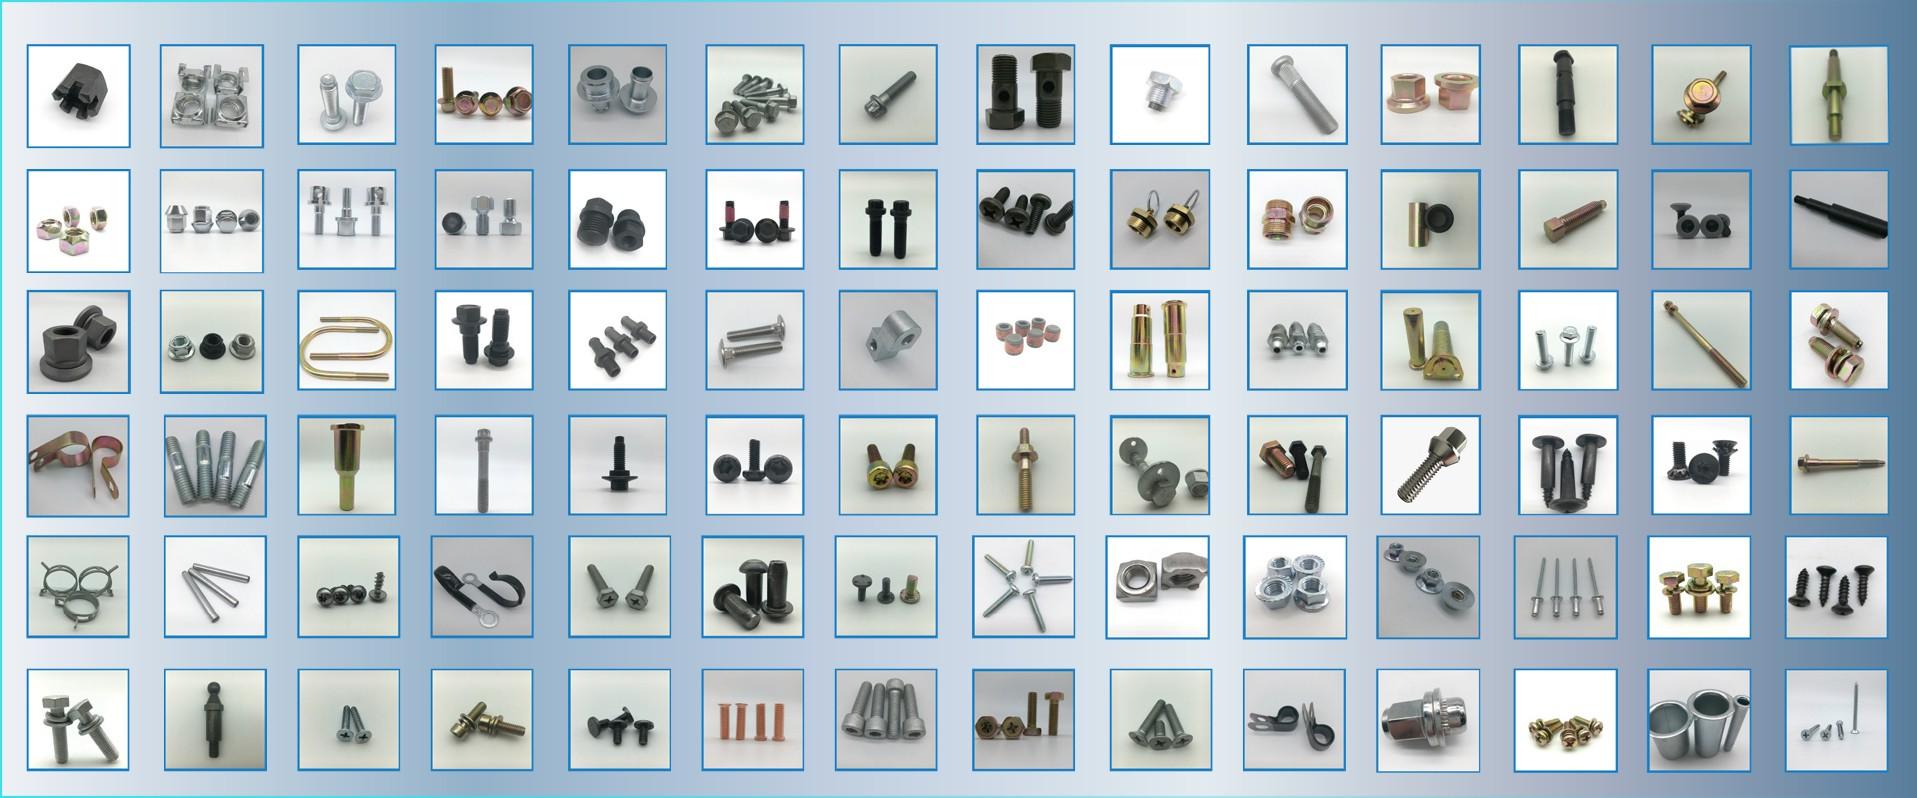 Flange screw press screw wheel bolt automotive fasteners